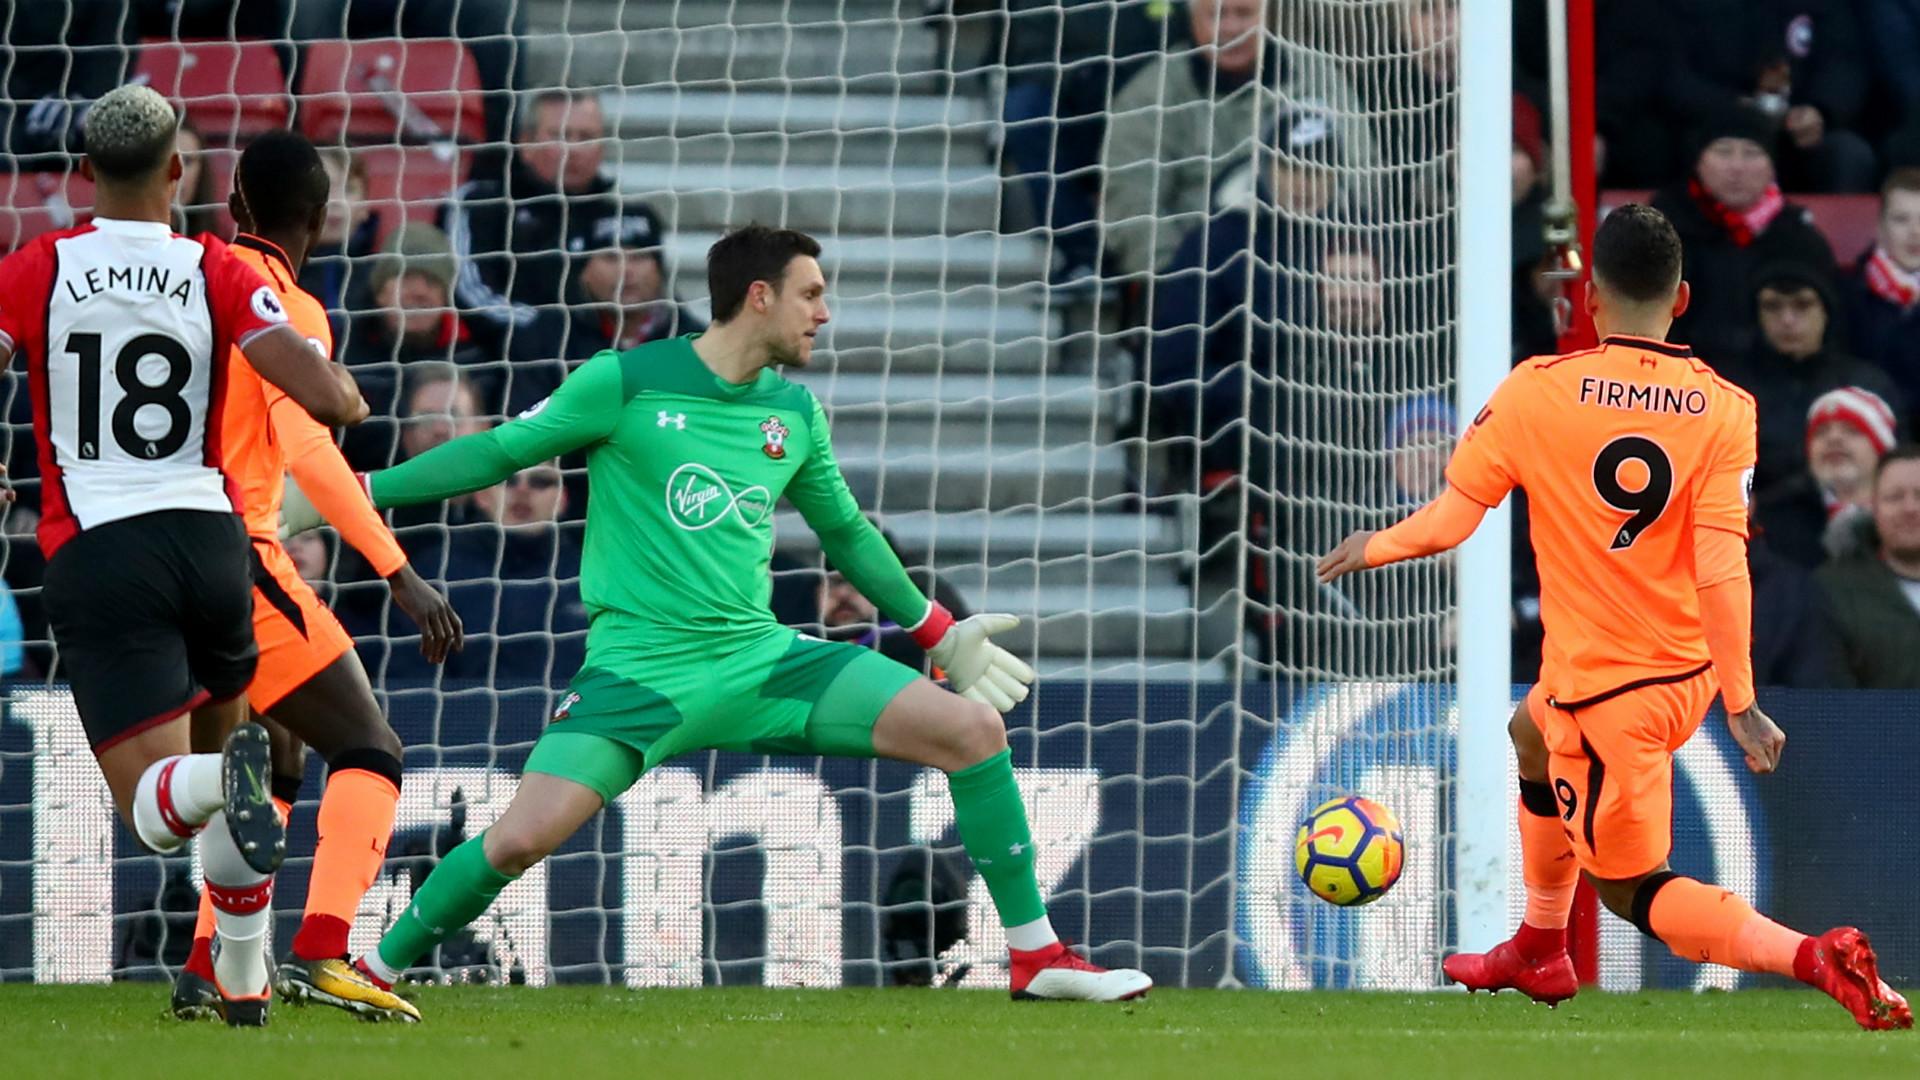 Firmino goal v Southampton